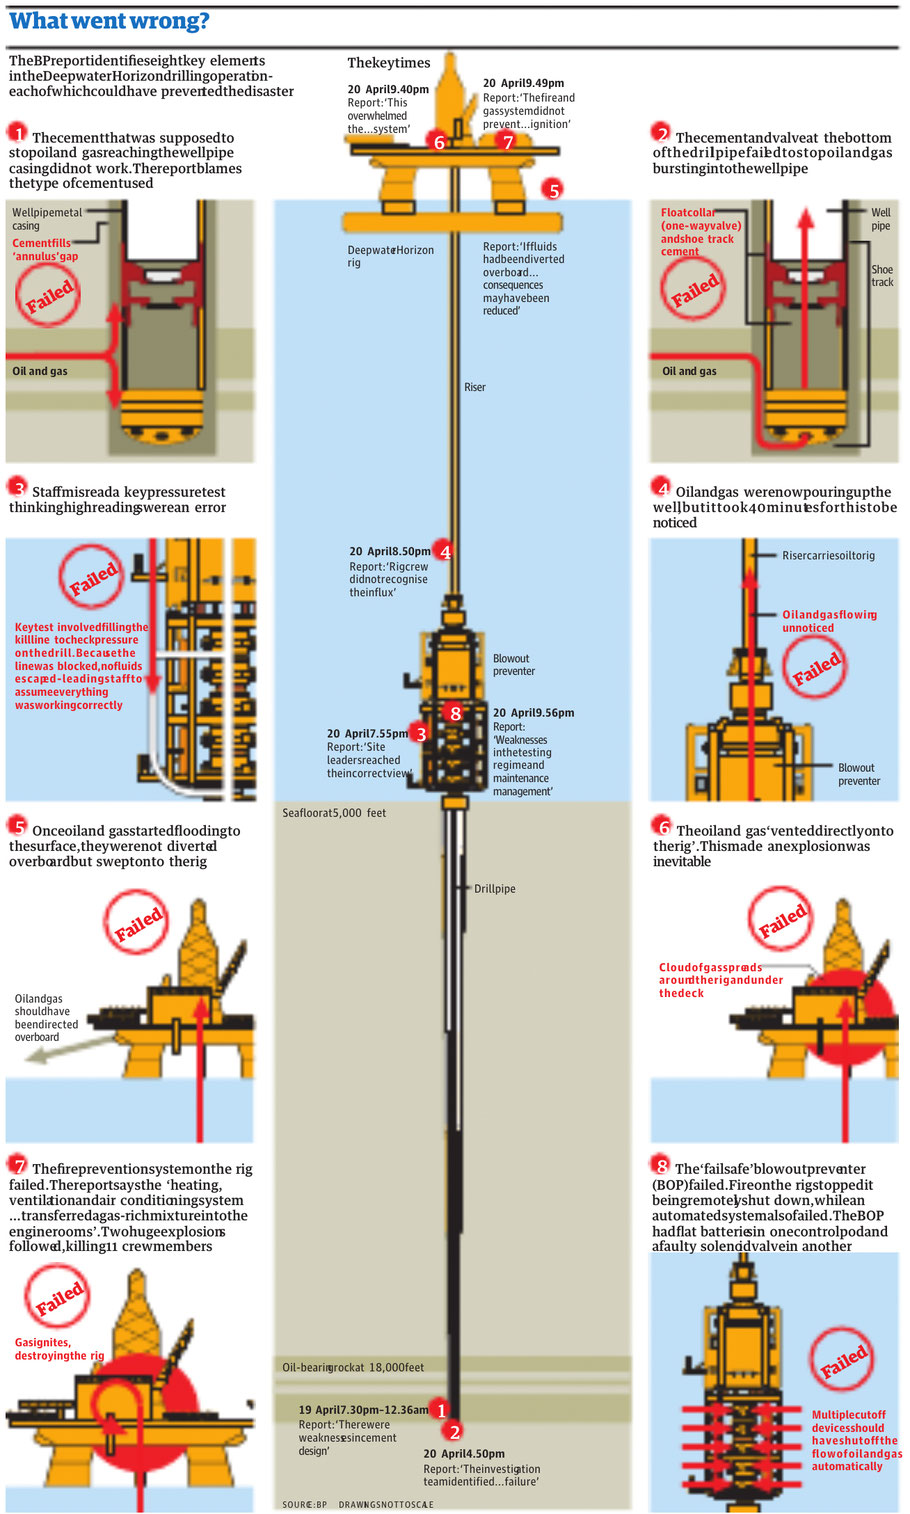 Deepwater Horizon - Katastrophe in Bildern - The Guardian - BP Report - Illustration Paul Scruton - kulturmaterial